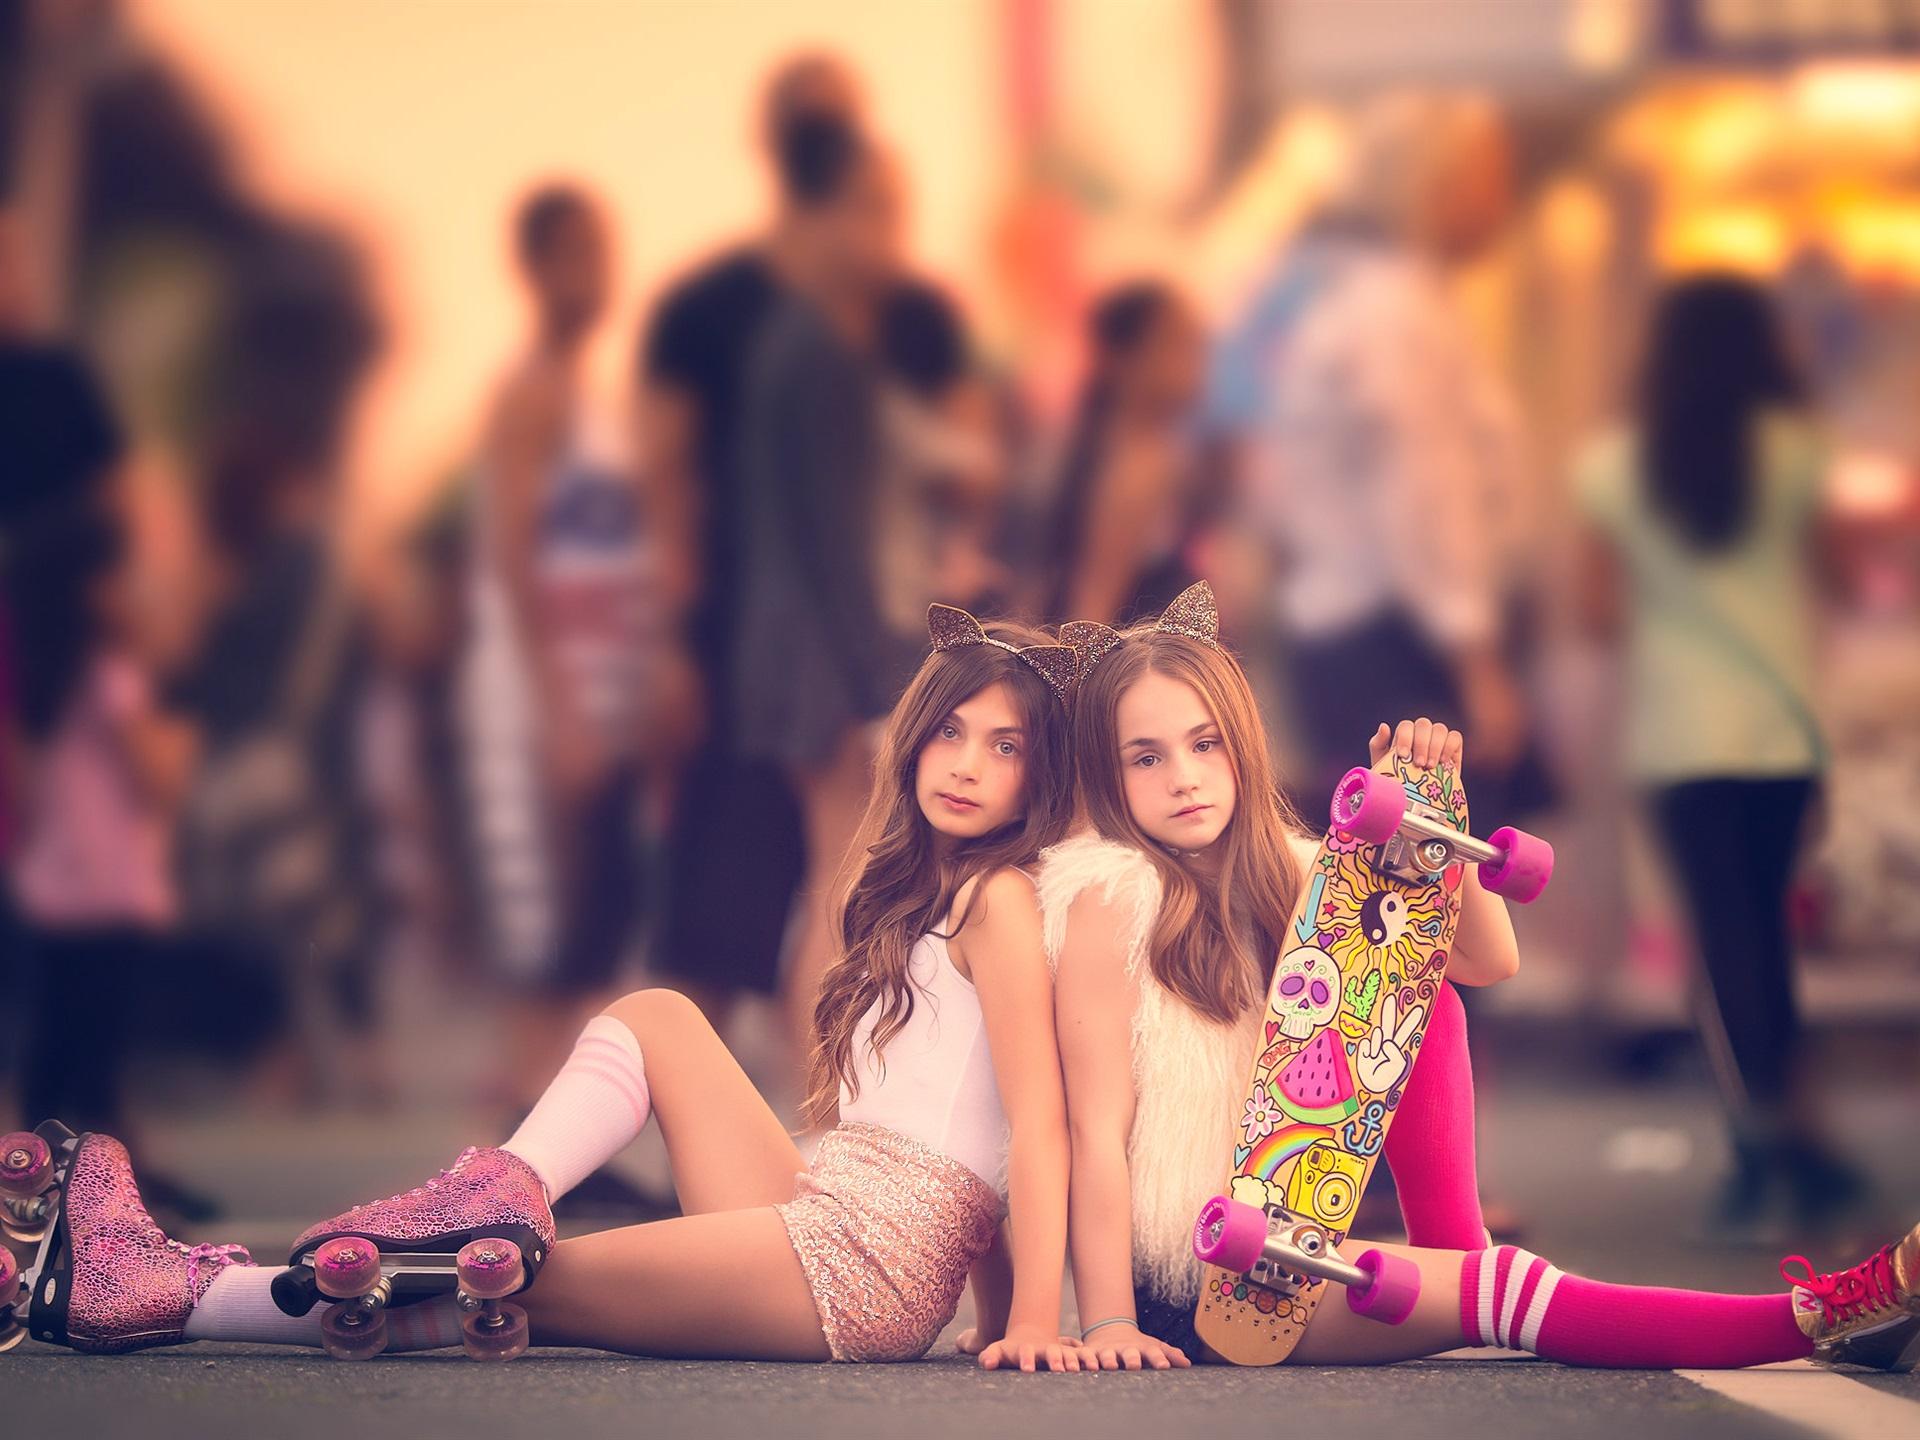 wallpaper two lovely little girls, child, street 1920x1440 hd